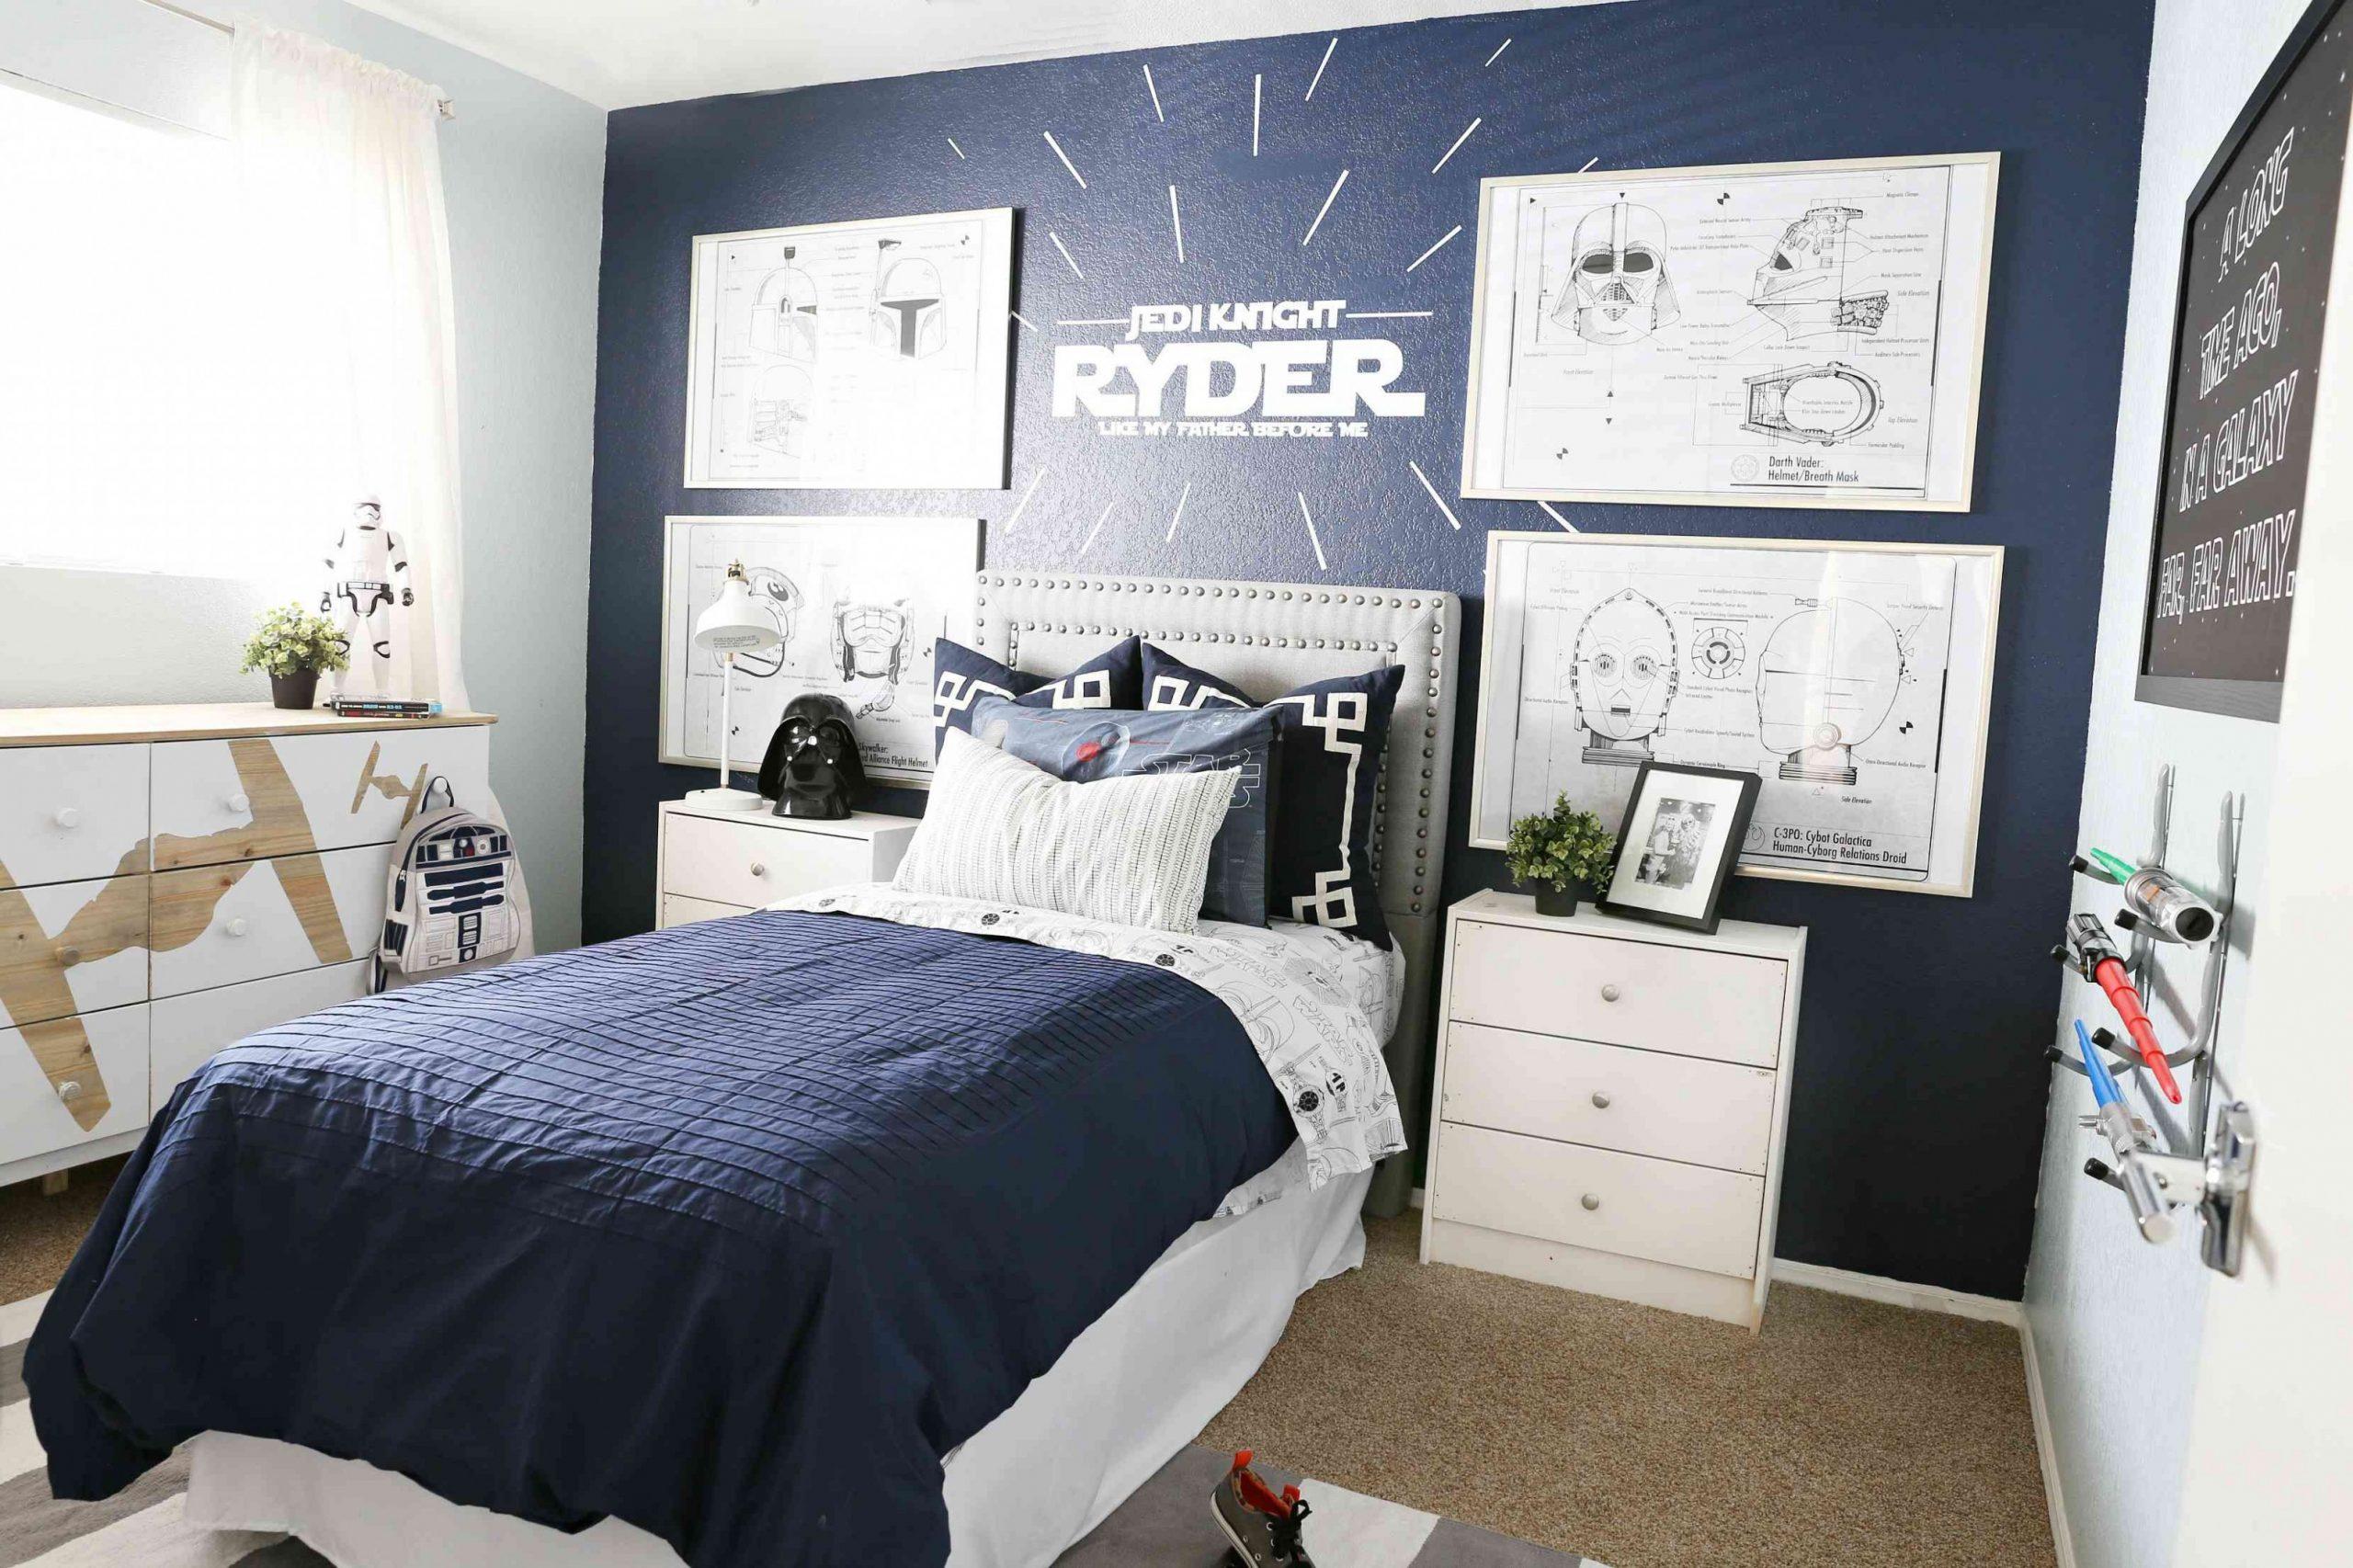 10 Creative Bedroom Ideas for Boys - Bedroom Ideas Male